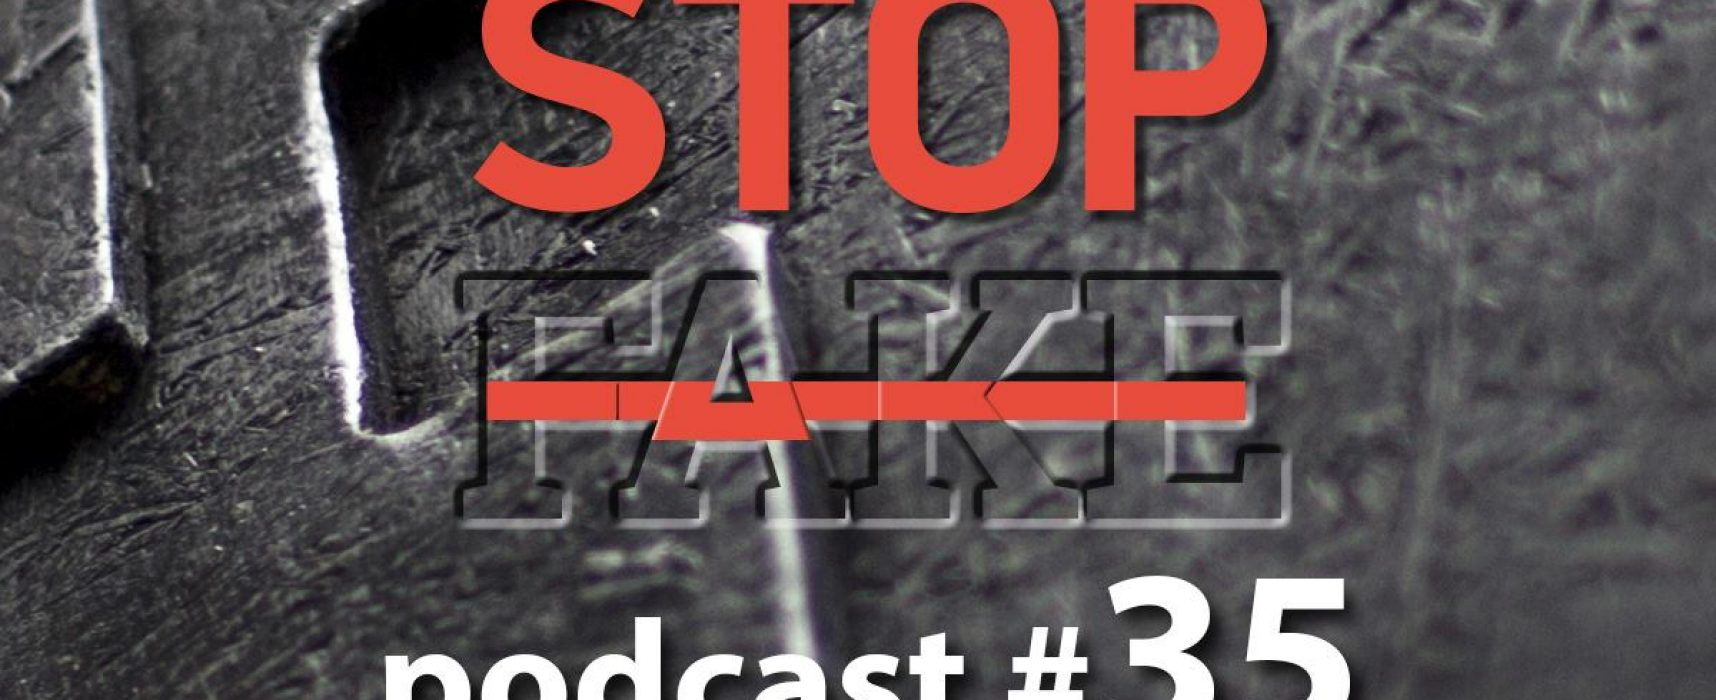 StopFake podcast #35